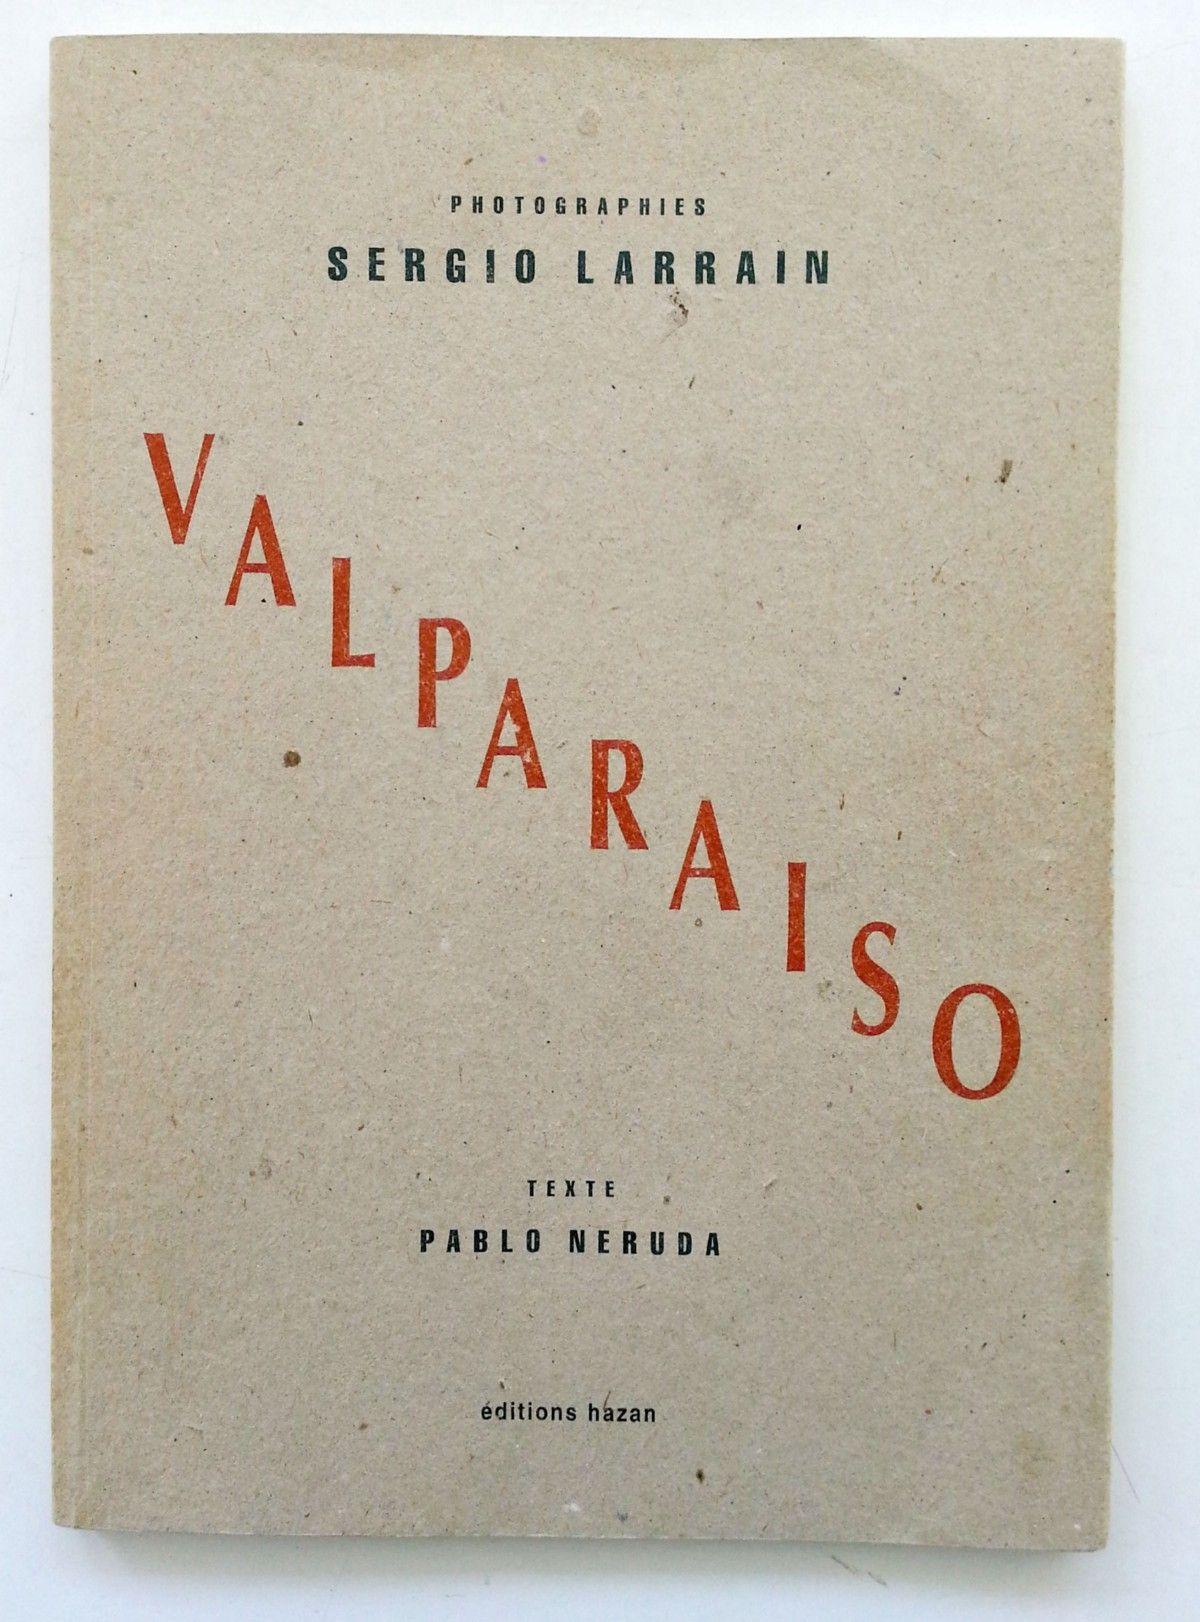 Sergio Larraín – Valparaiso